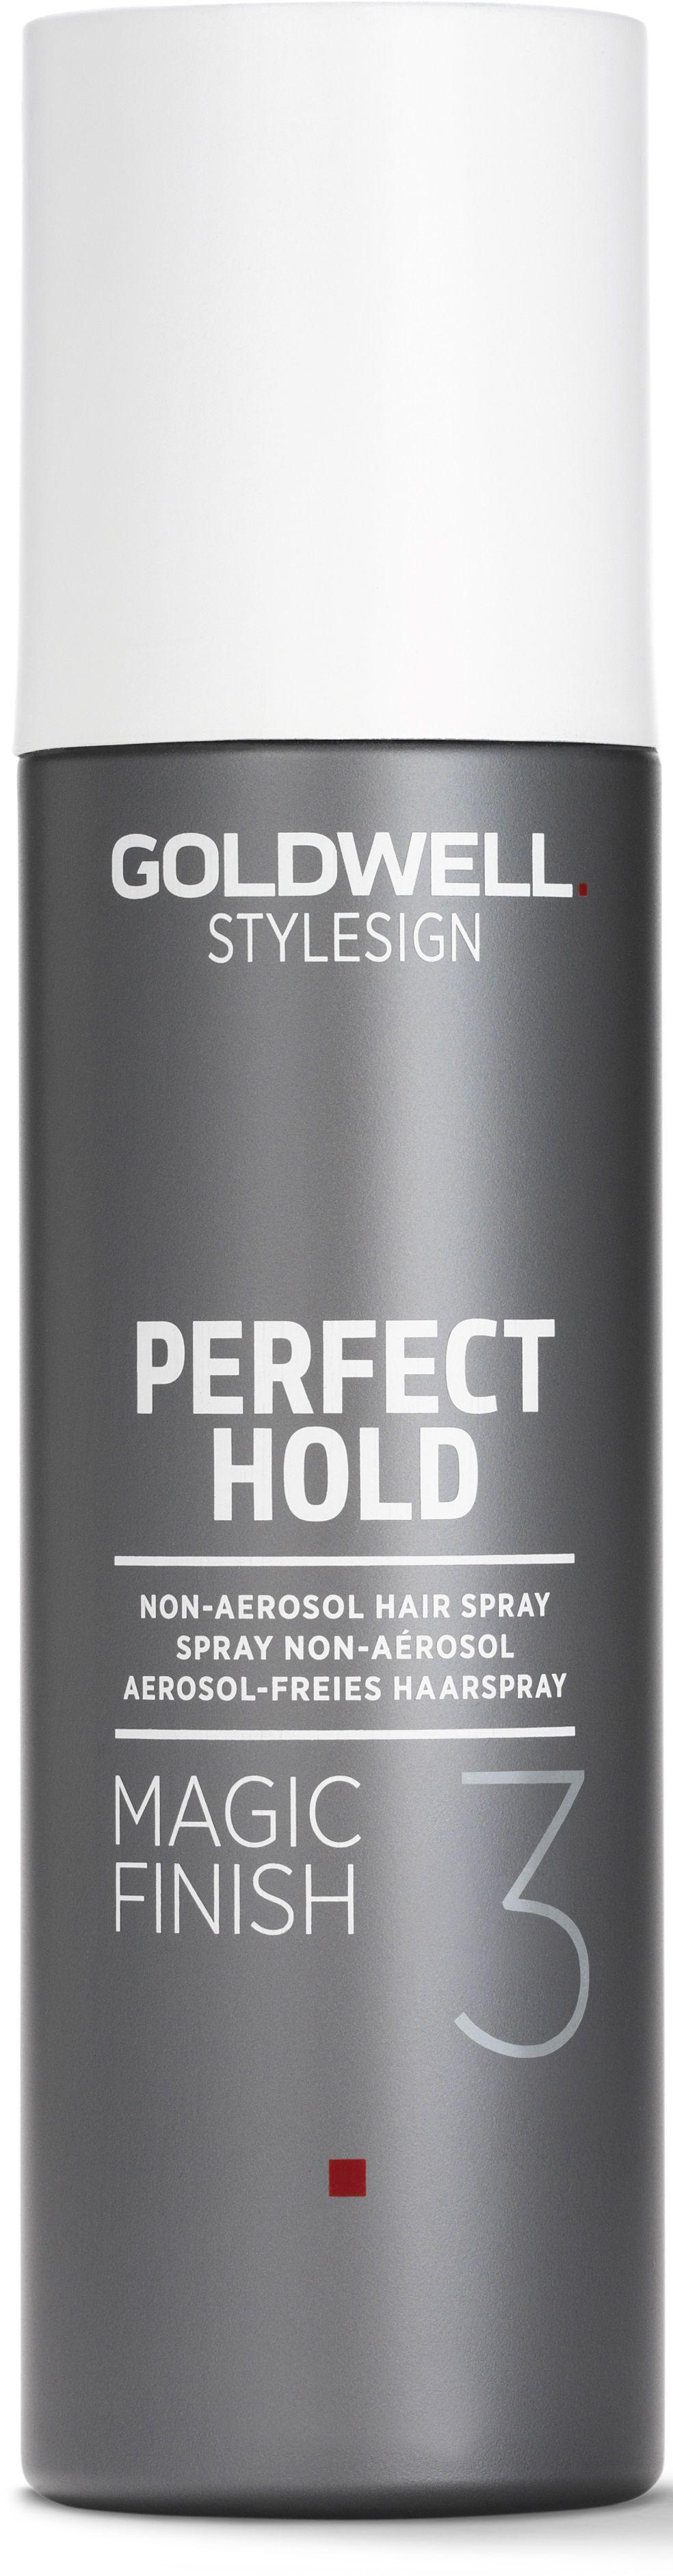 Goldwell Stylesign Perfect Hold Magic Finish 3 NonAerosol